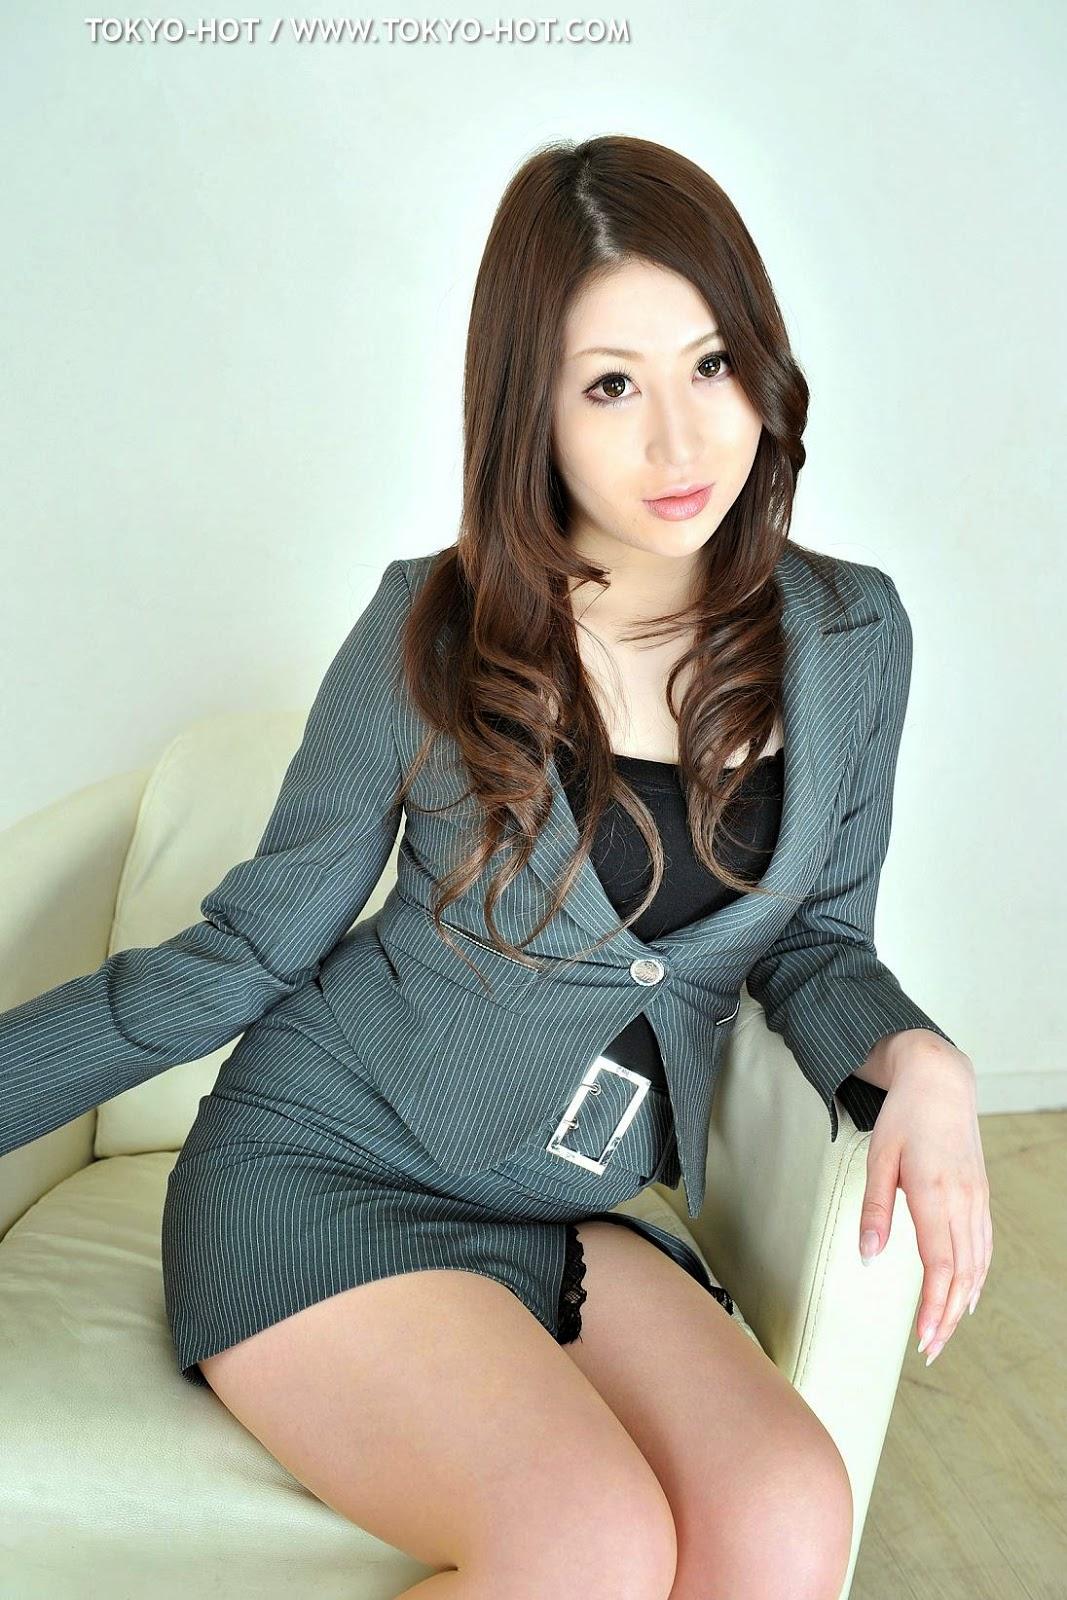 Sayuki Hojo 北�l�雪 @ Tokyo-Hot Uncensored �C Gravure Girls